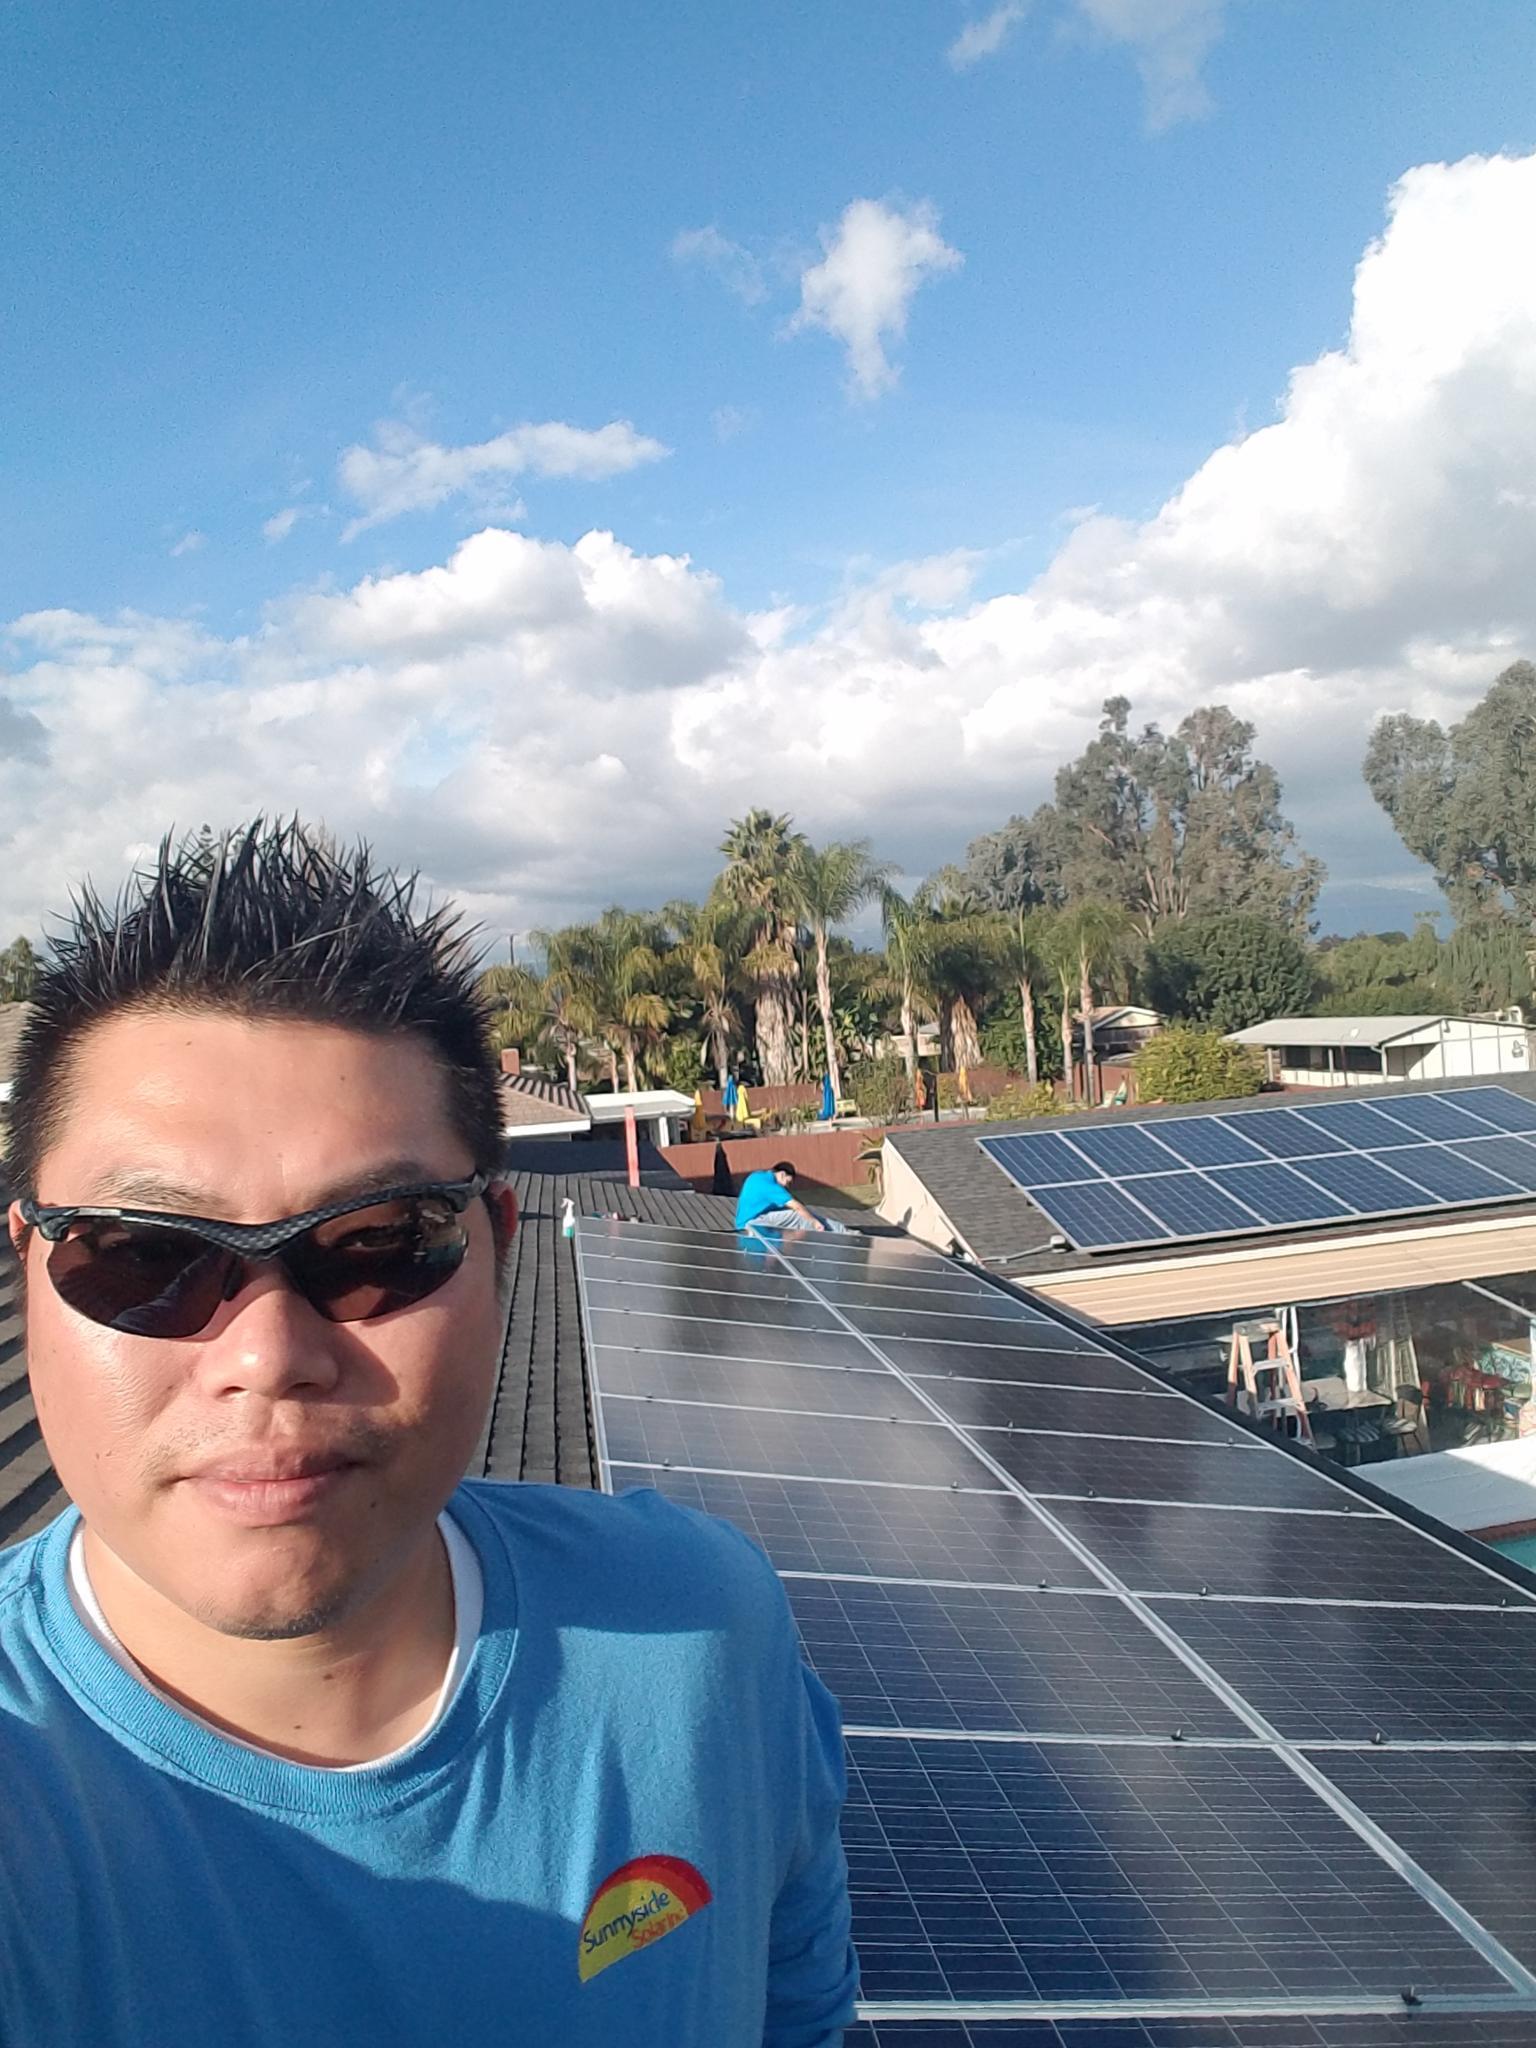 Sunnyside Solar Inc Profile Amp Reviews 2019 Energysage